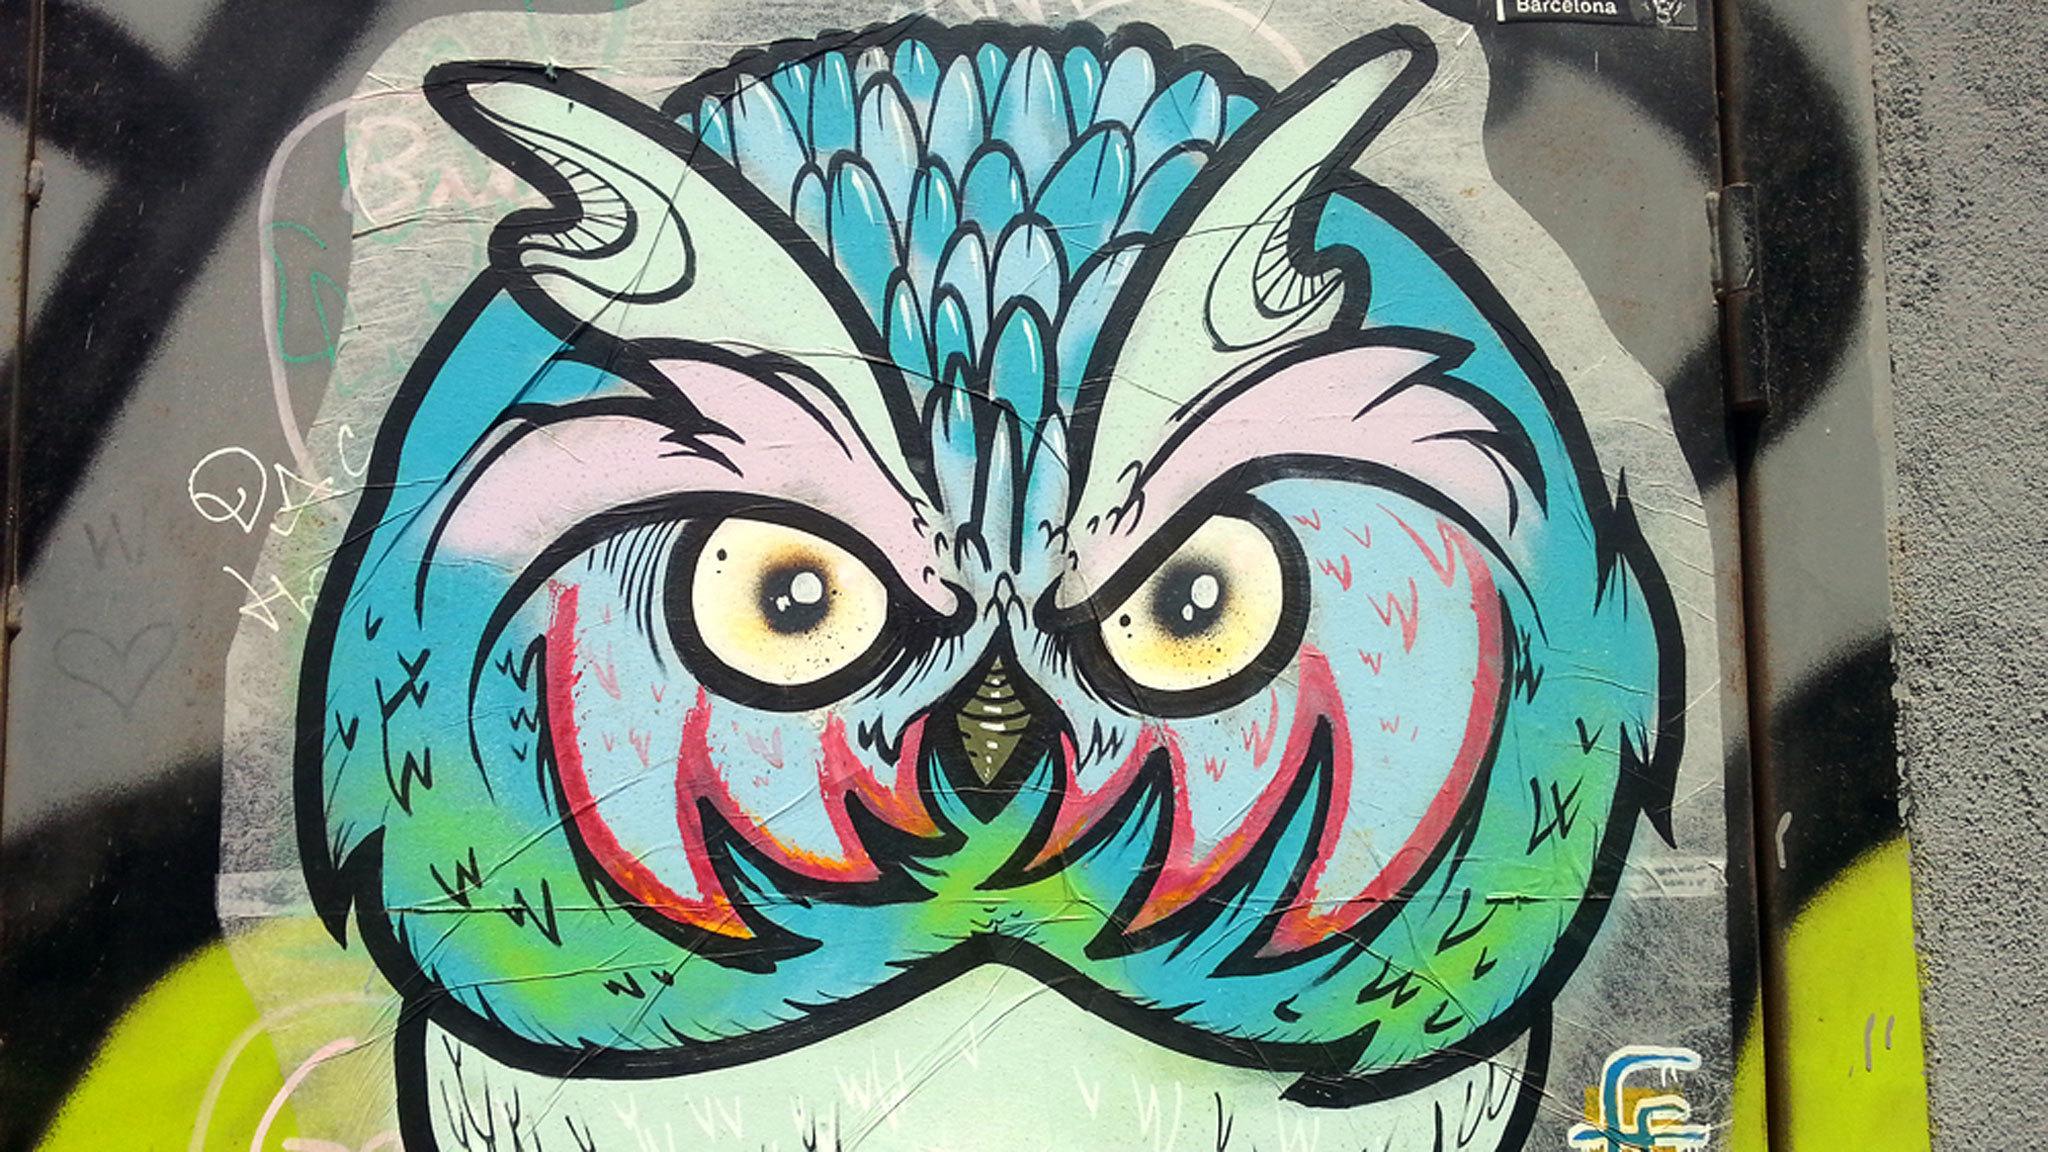 Street Art in Poble Nou, Barcelona